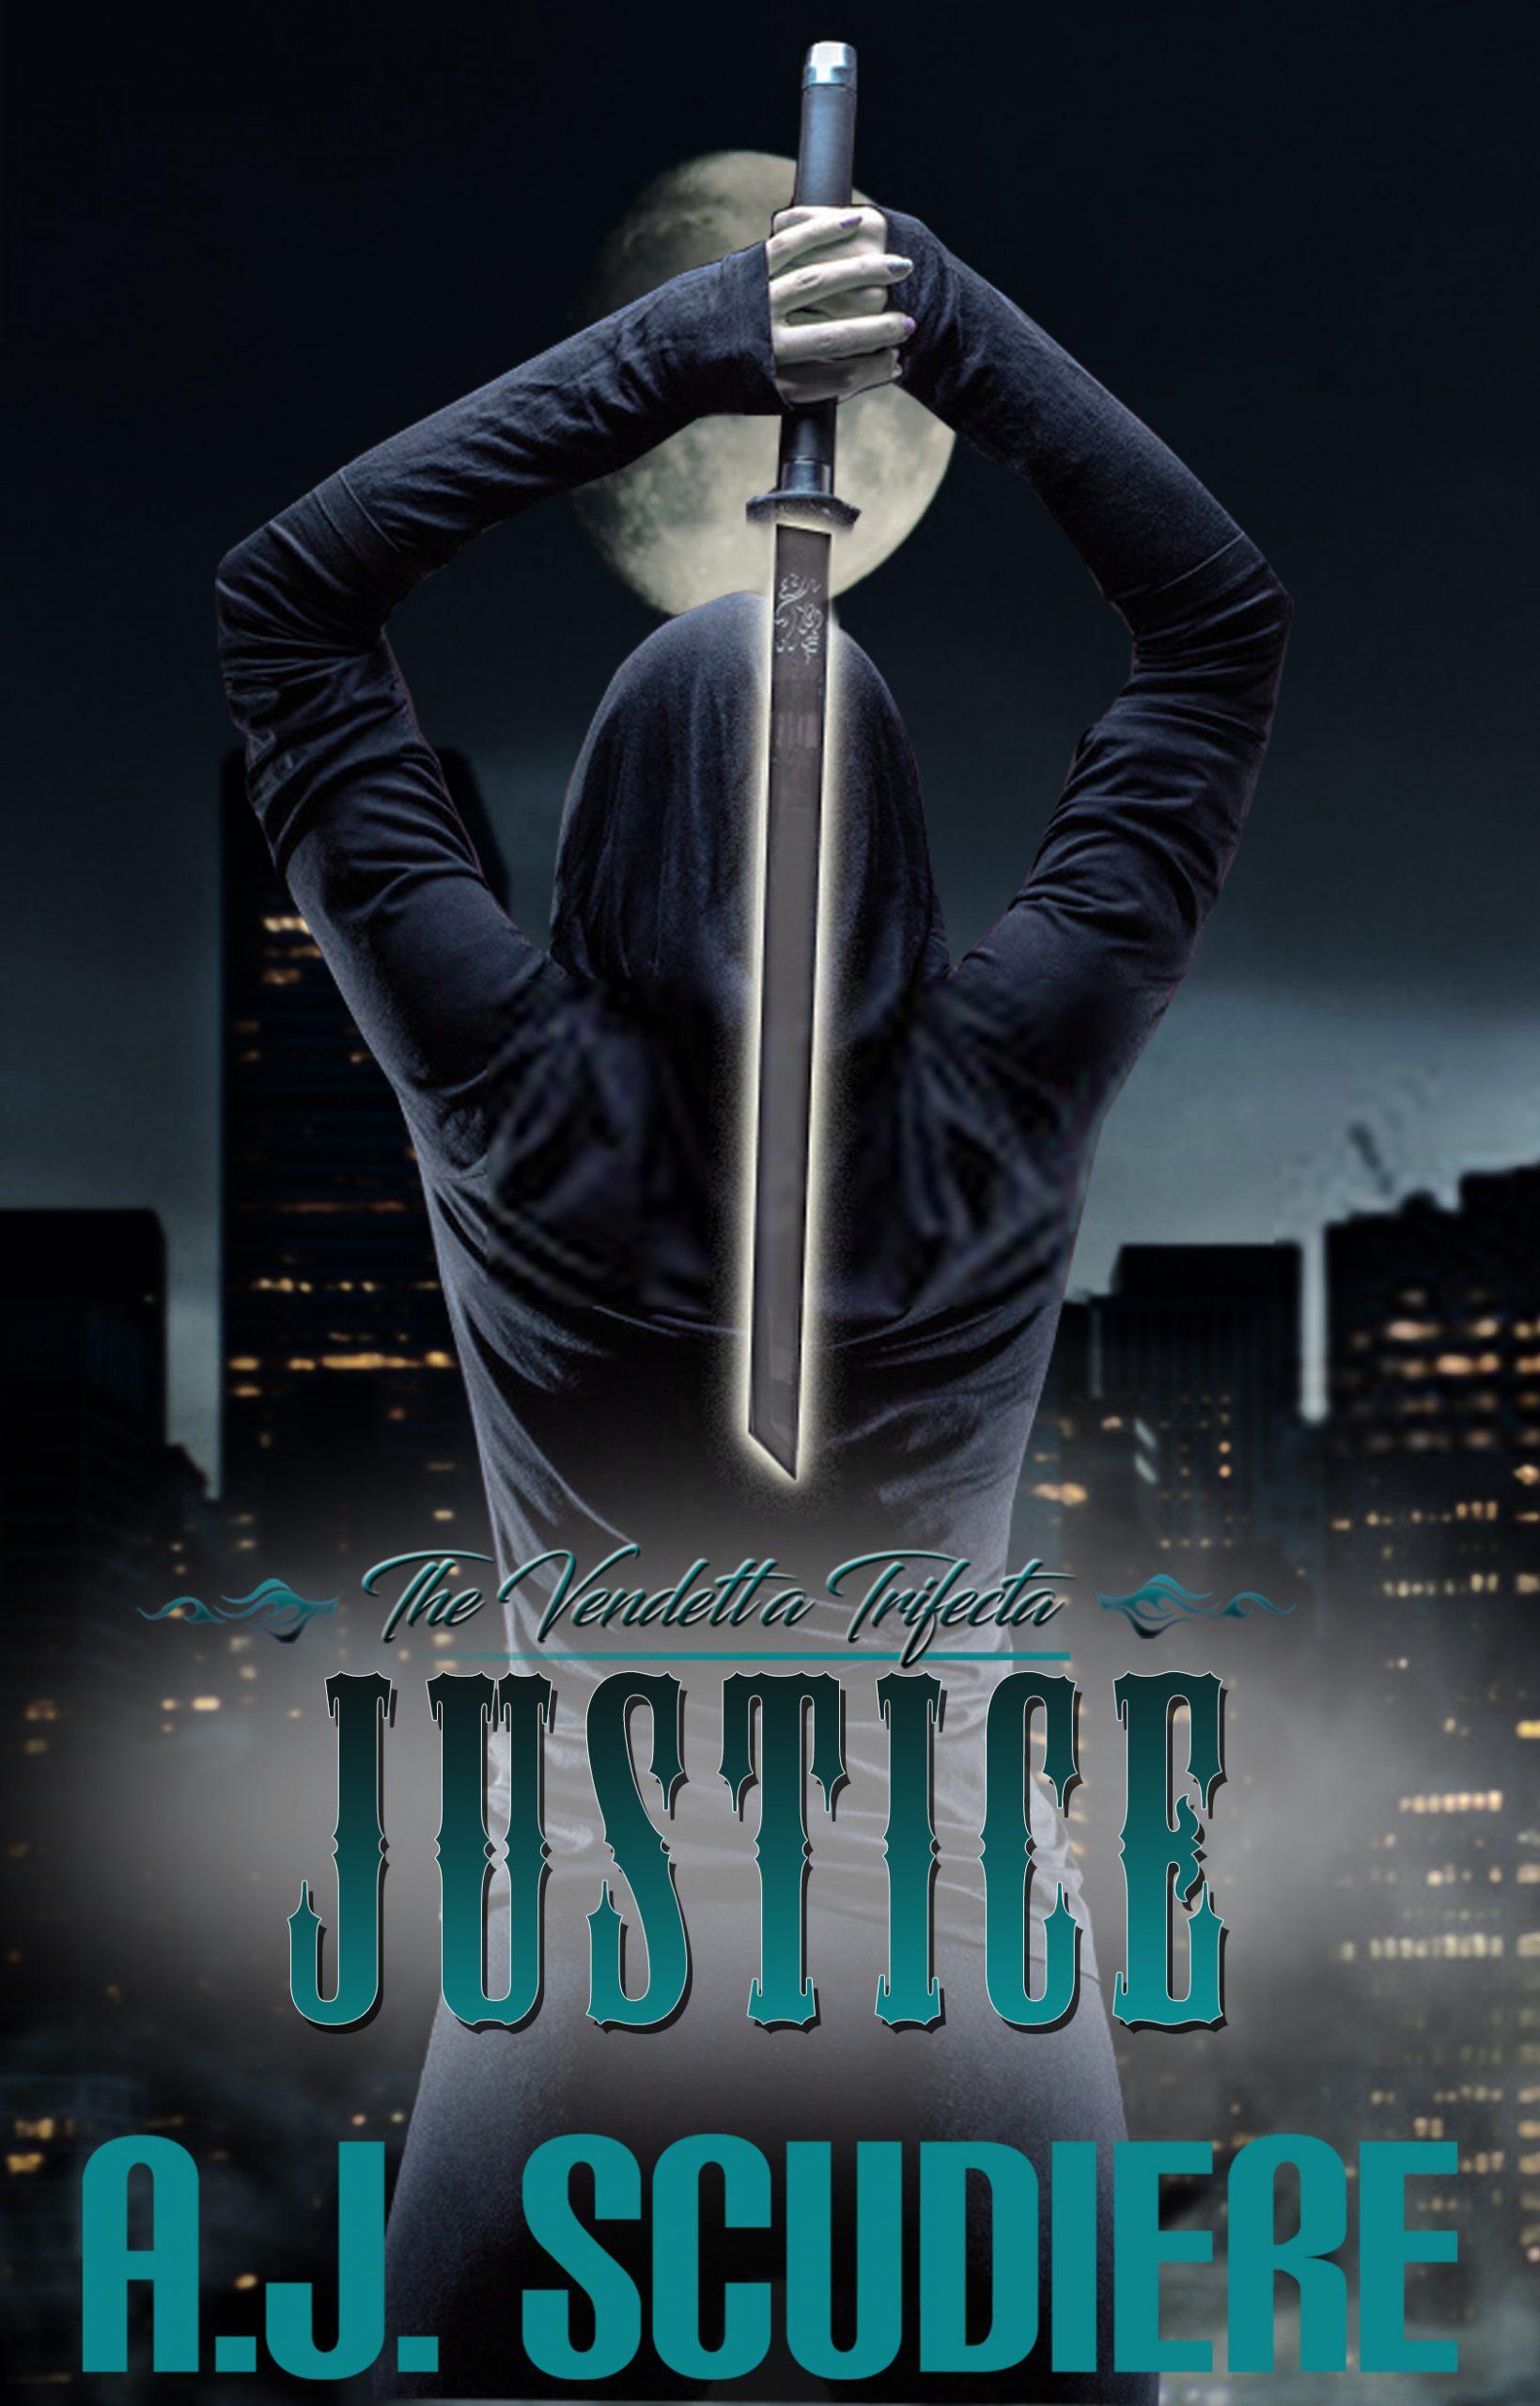 Justice - Vendetta Trifecta #3